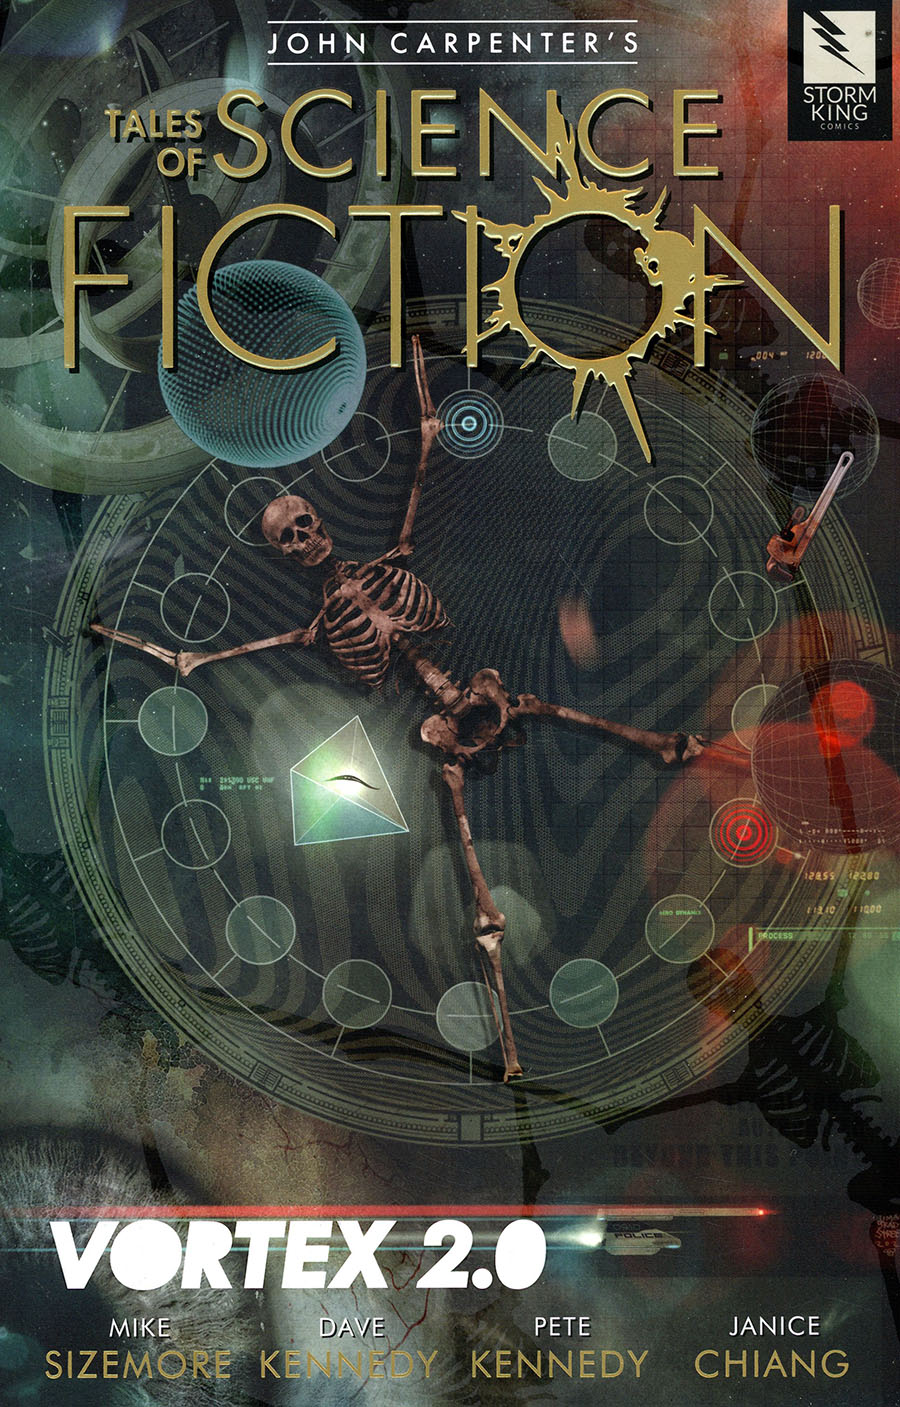 John Carpenters Tales Of Science Fiction Vortex 2.0 TP